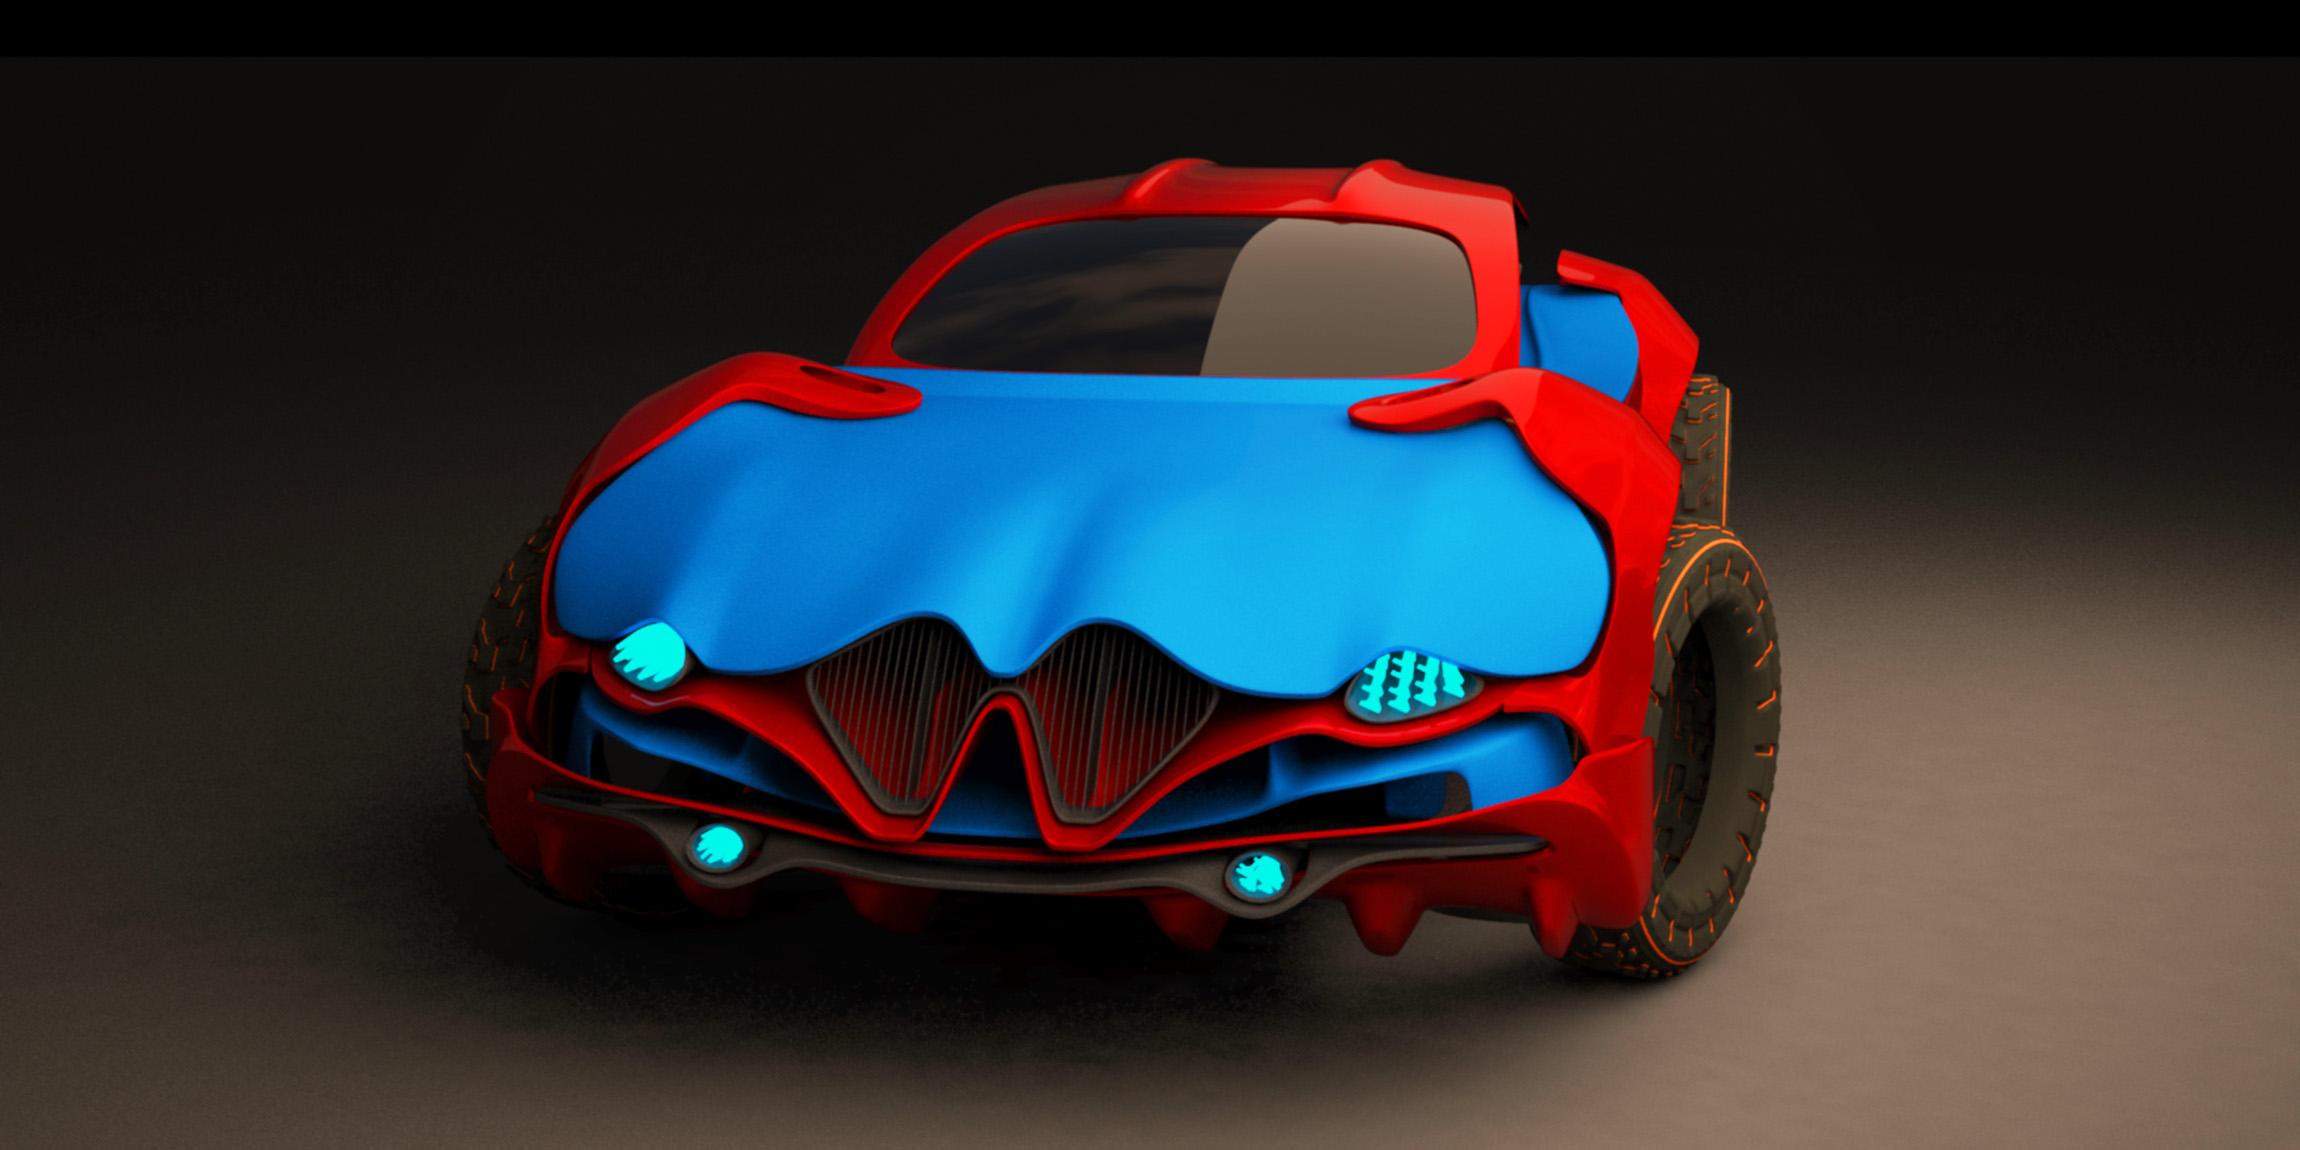 HUM3D car design challenge 2019 gbeg